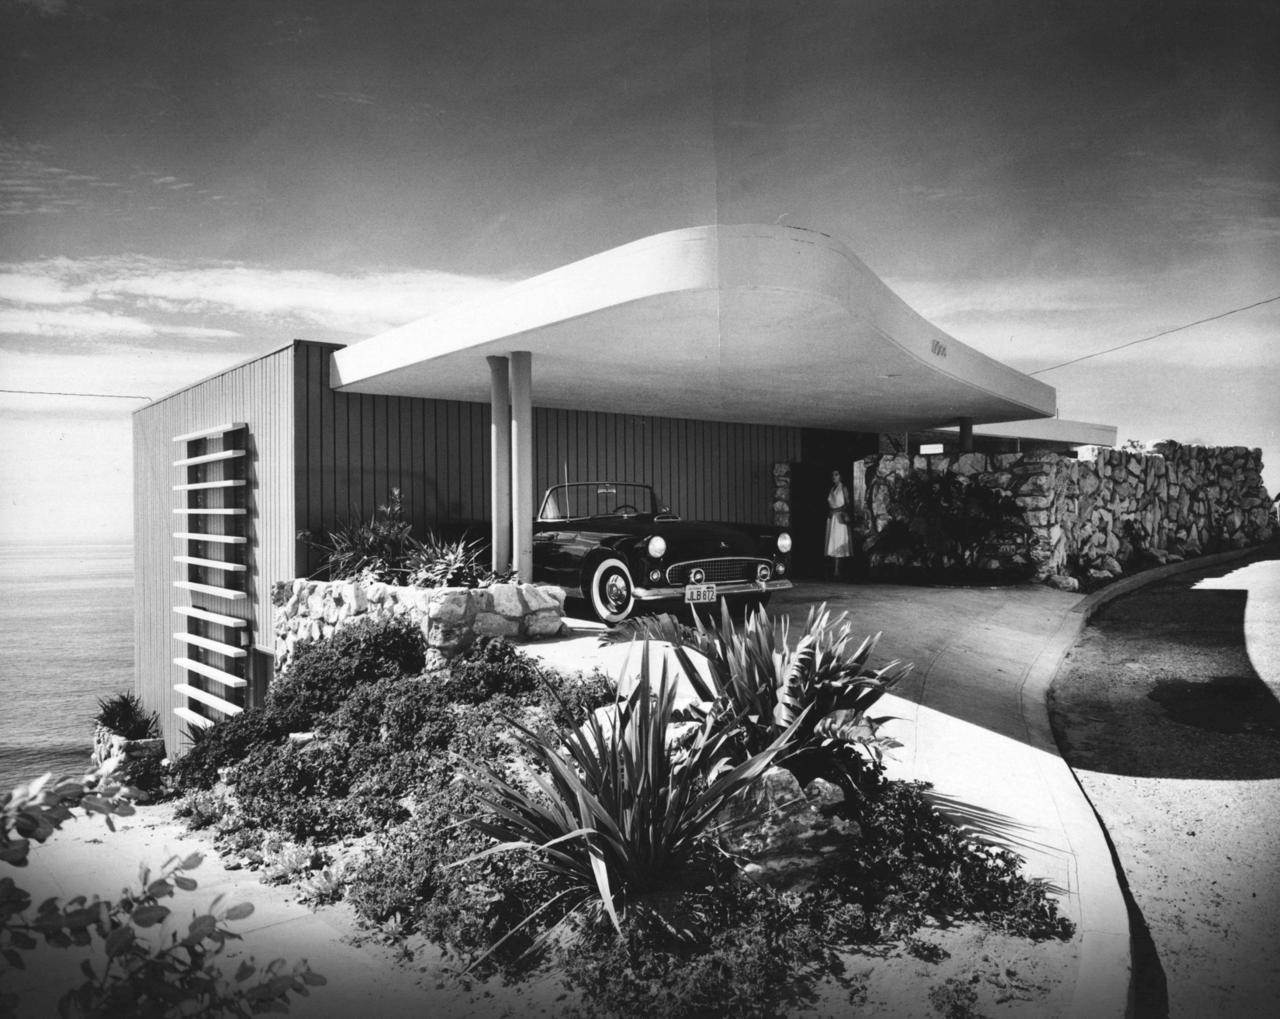 spencer house, aka the malibu house, pacific palisades, photos by julius shulman @ midcenturymodernfreak